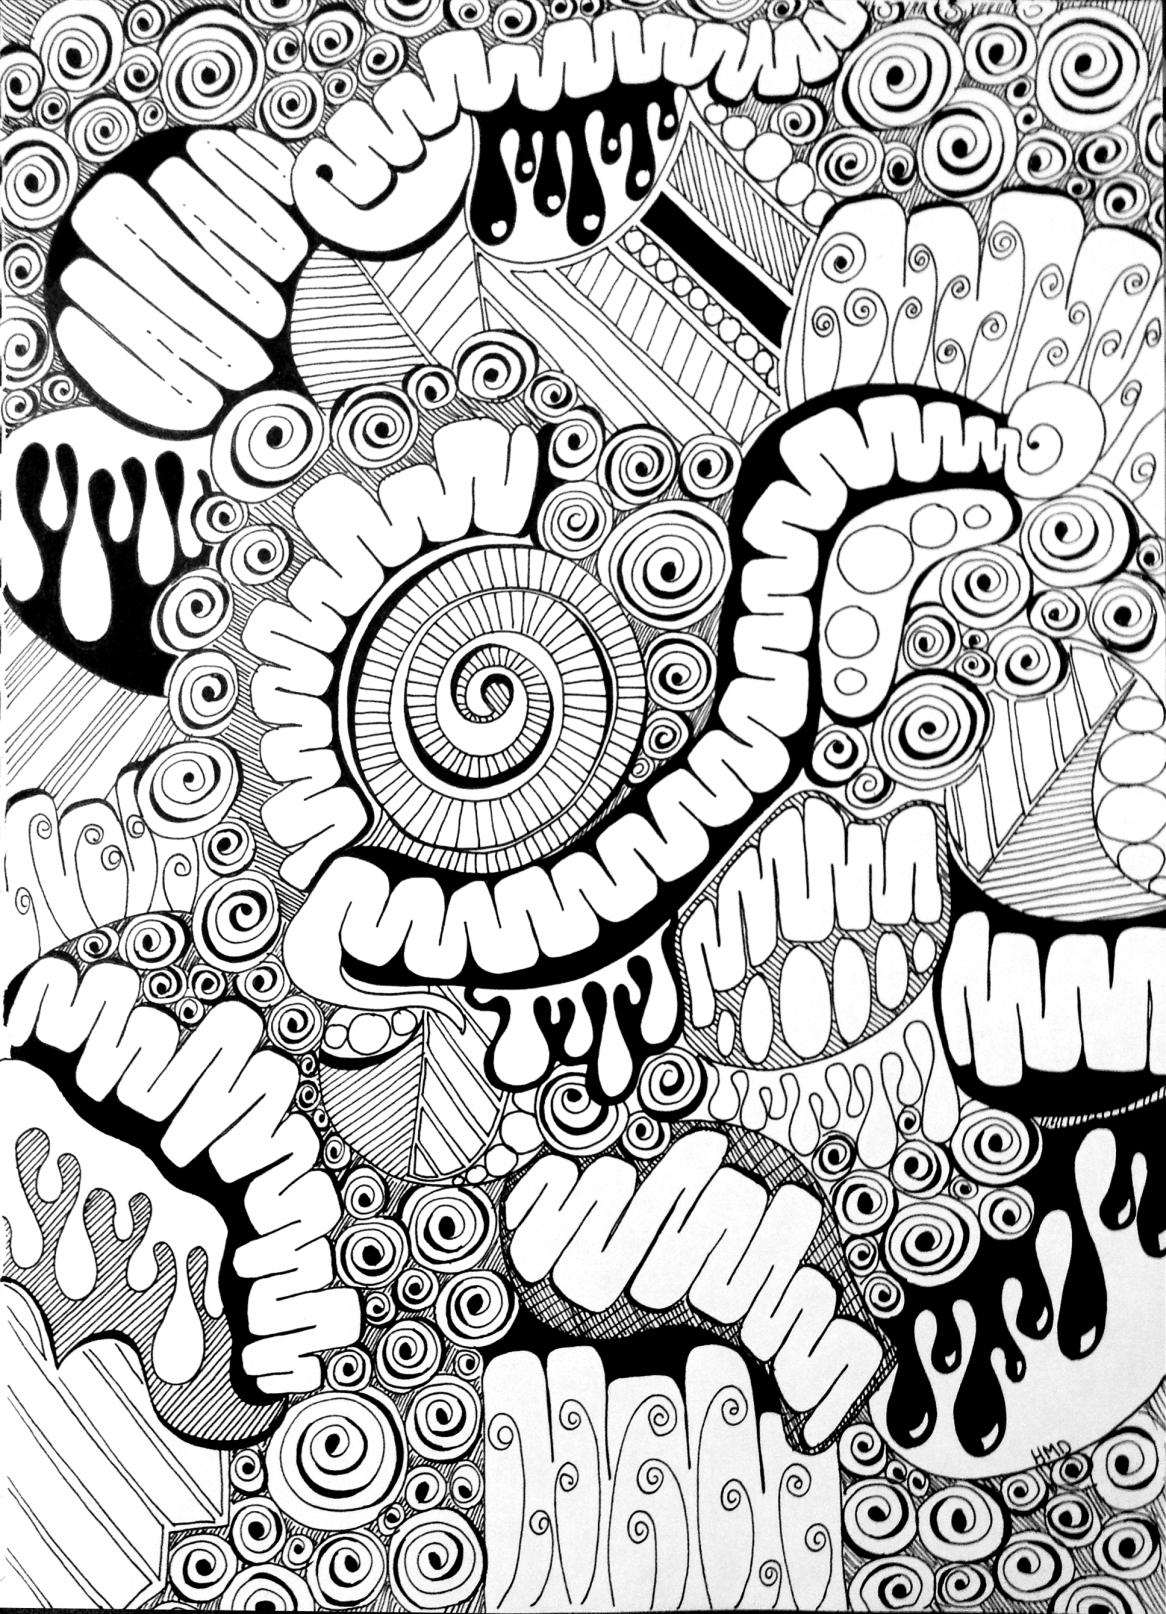 1166x1614 New! Doodle Prompt Viscera Phantasma Sharpie Art, Doodles And Draw